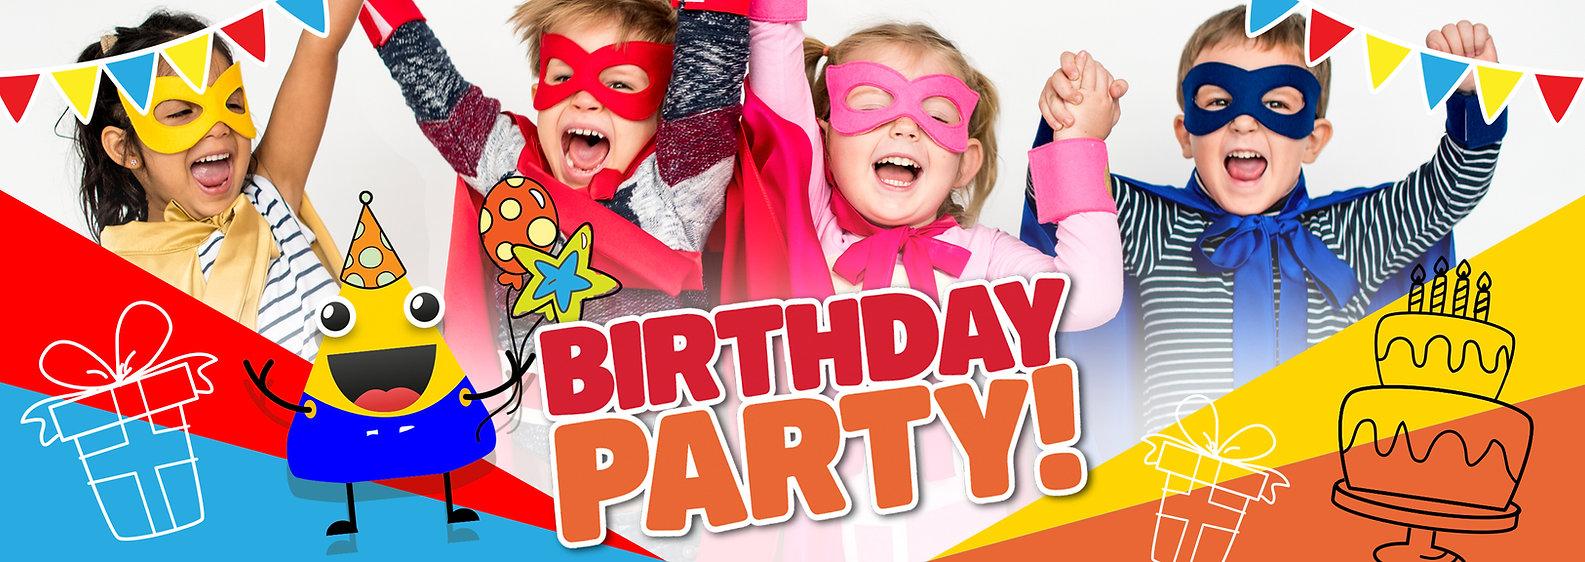 WebHeaders_BirthdayParty.jpg